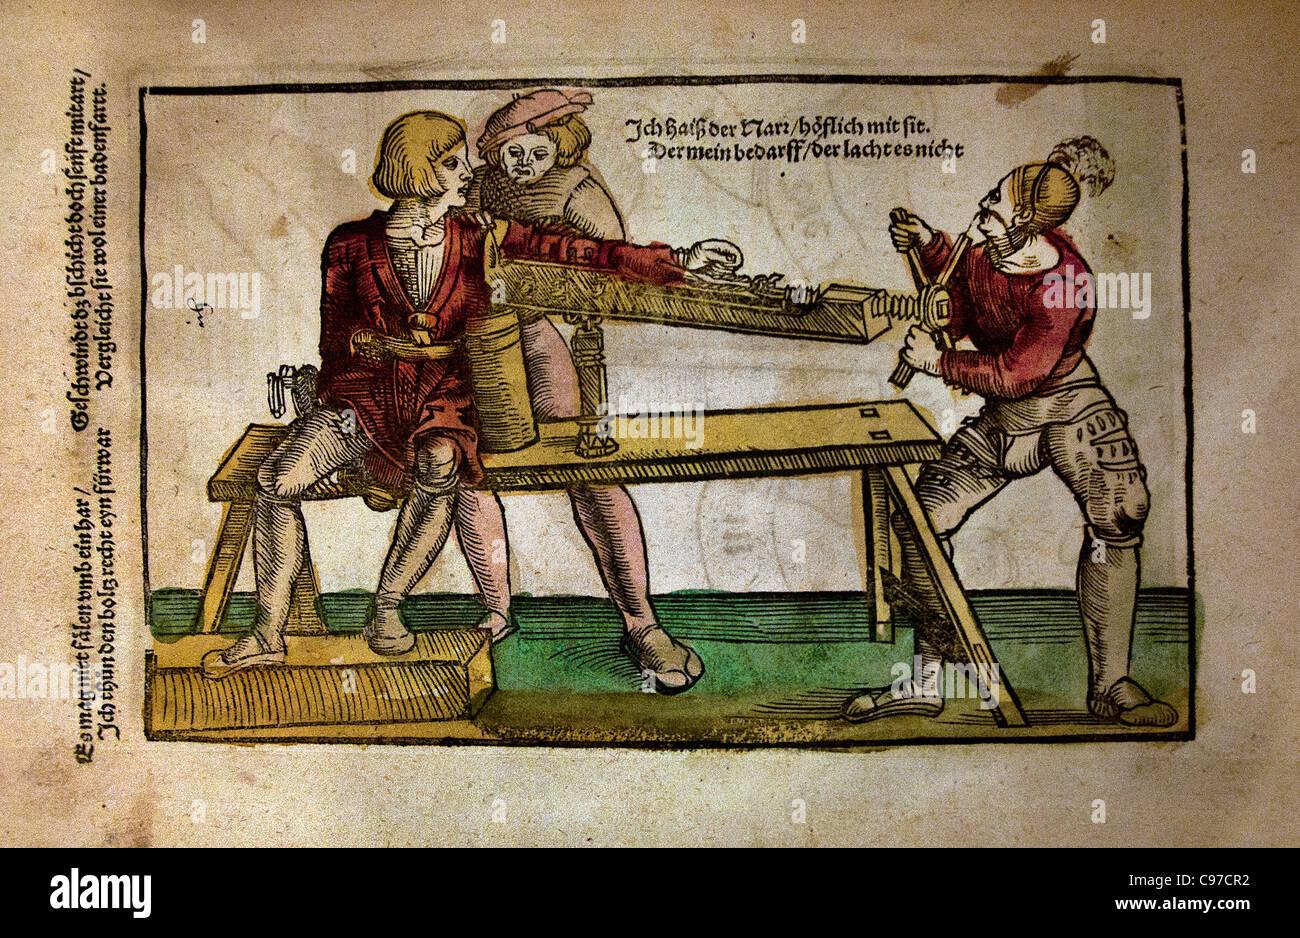 Hans von Gersdorff 1529 Domaine chirurgien Chirurgie des plaies livre allemand Allemagne Photo Stock